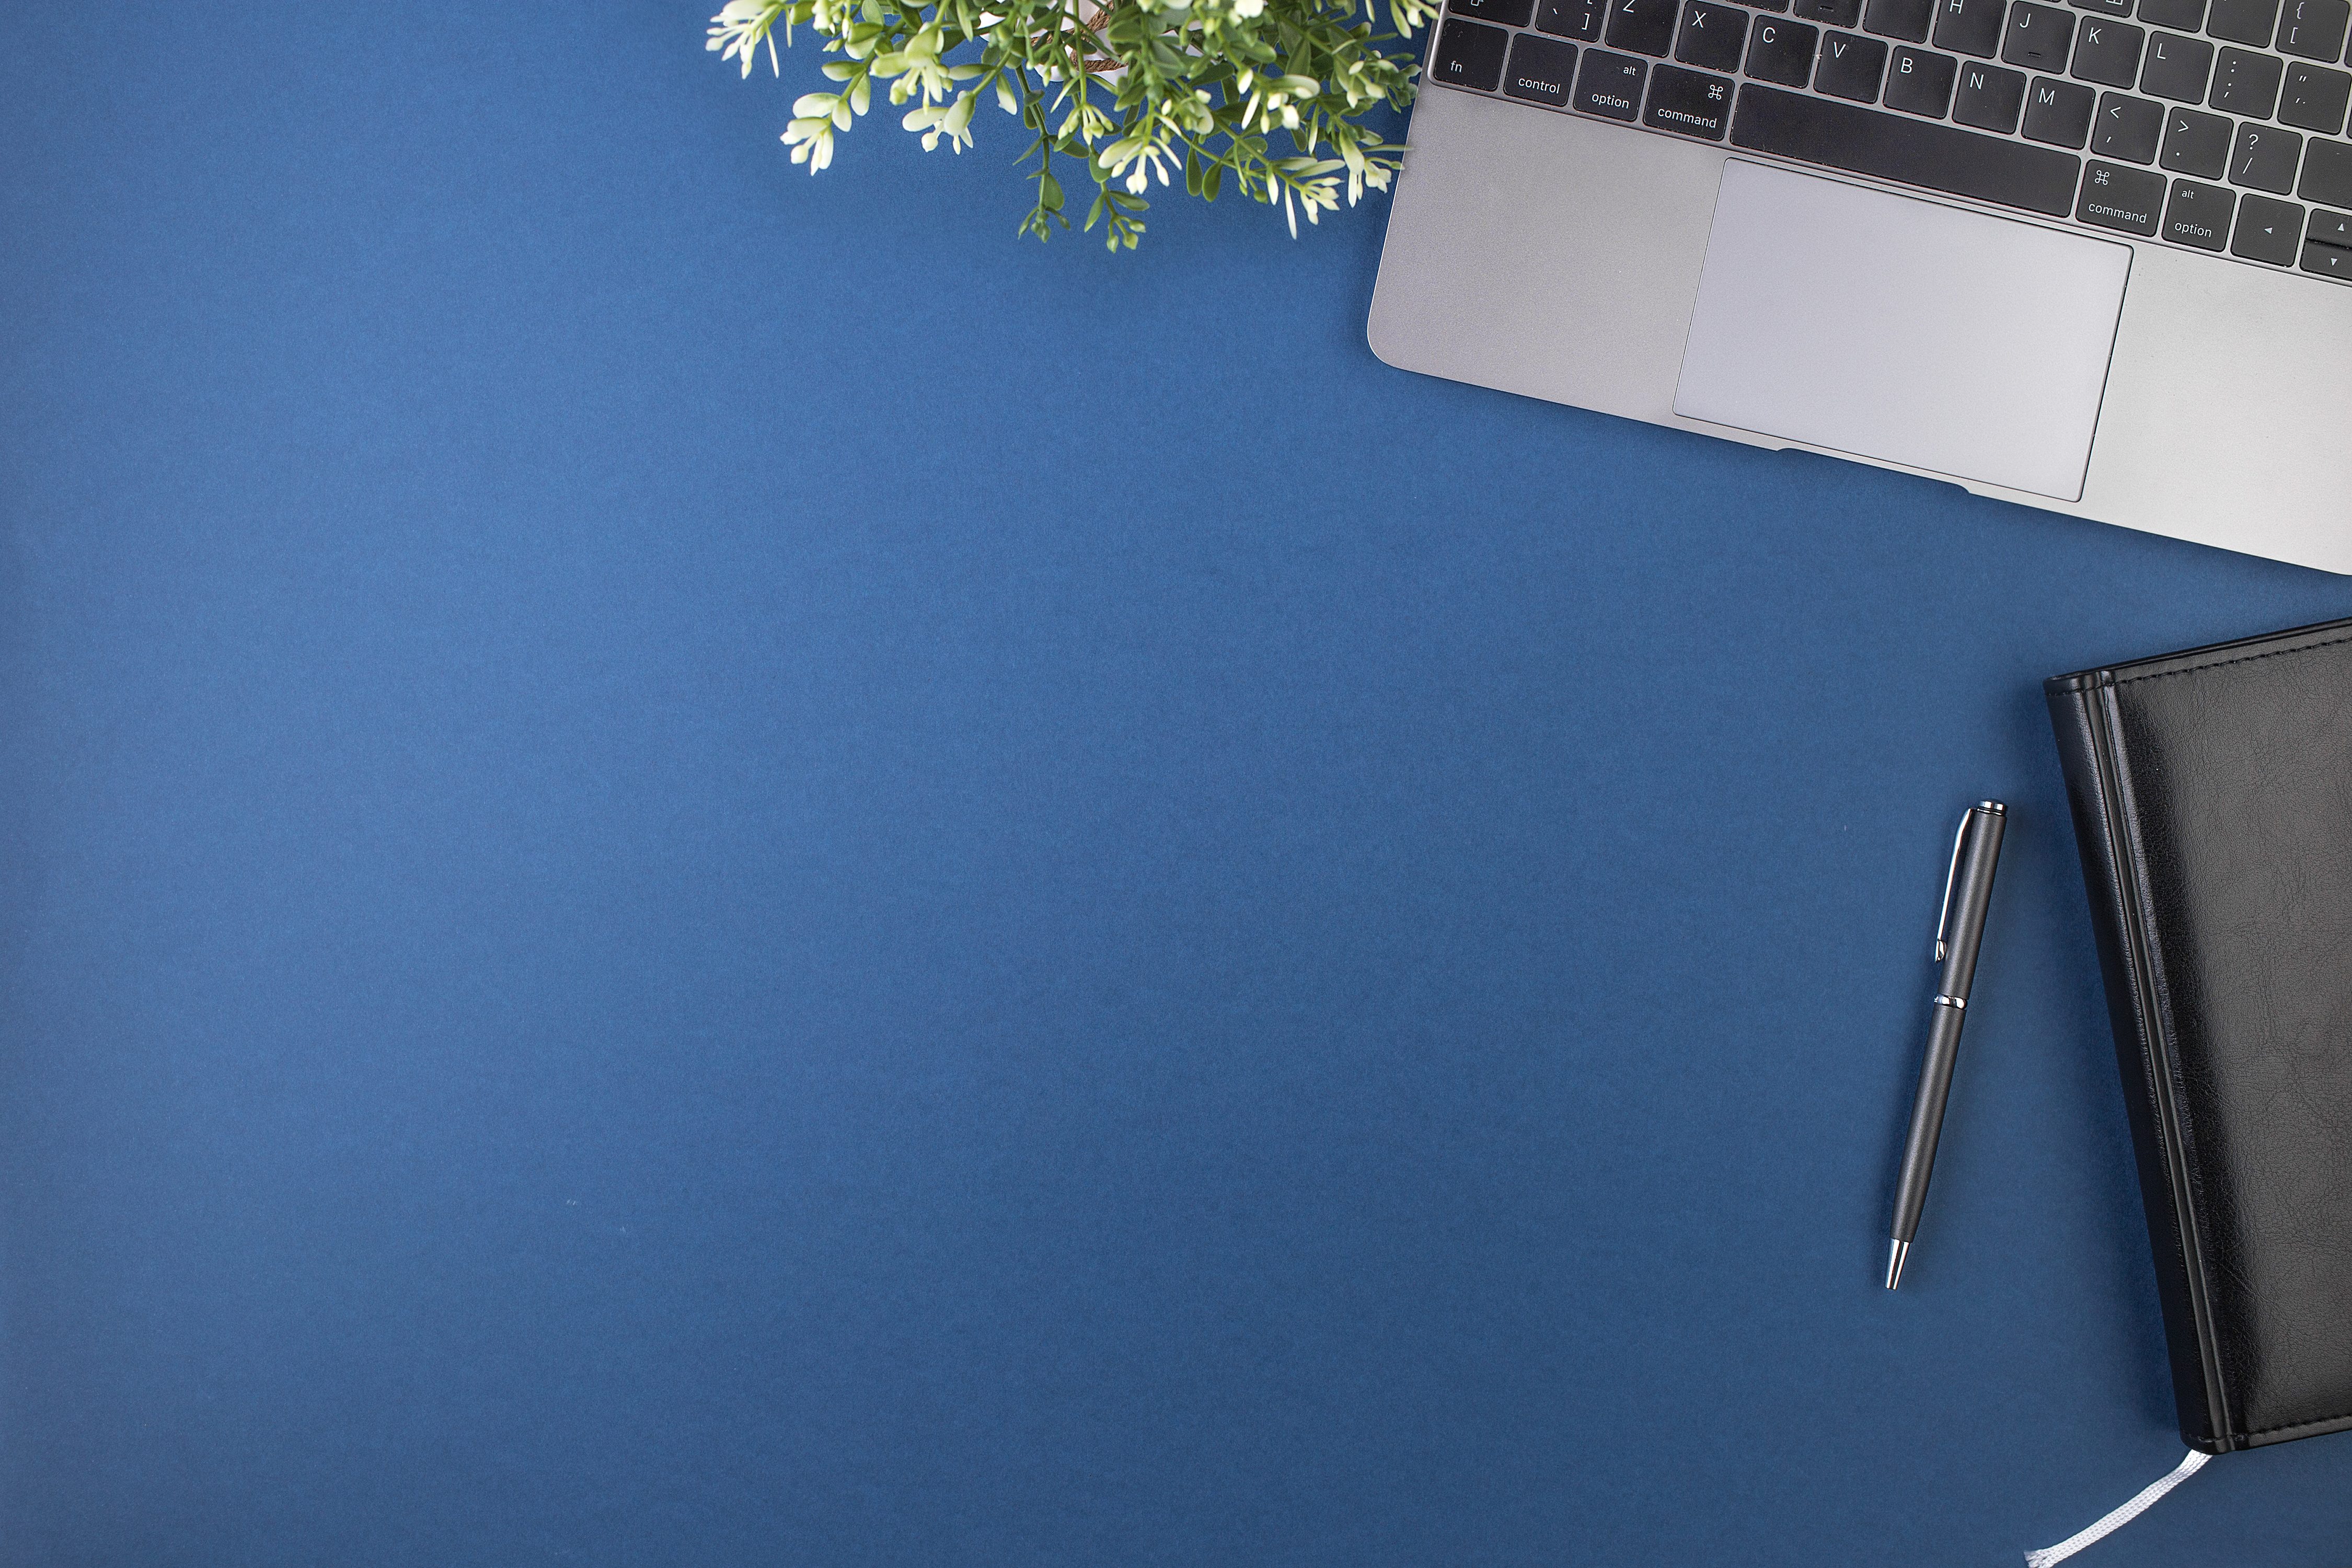 workspace, blue, background, desk